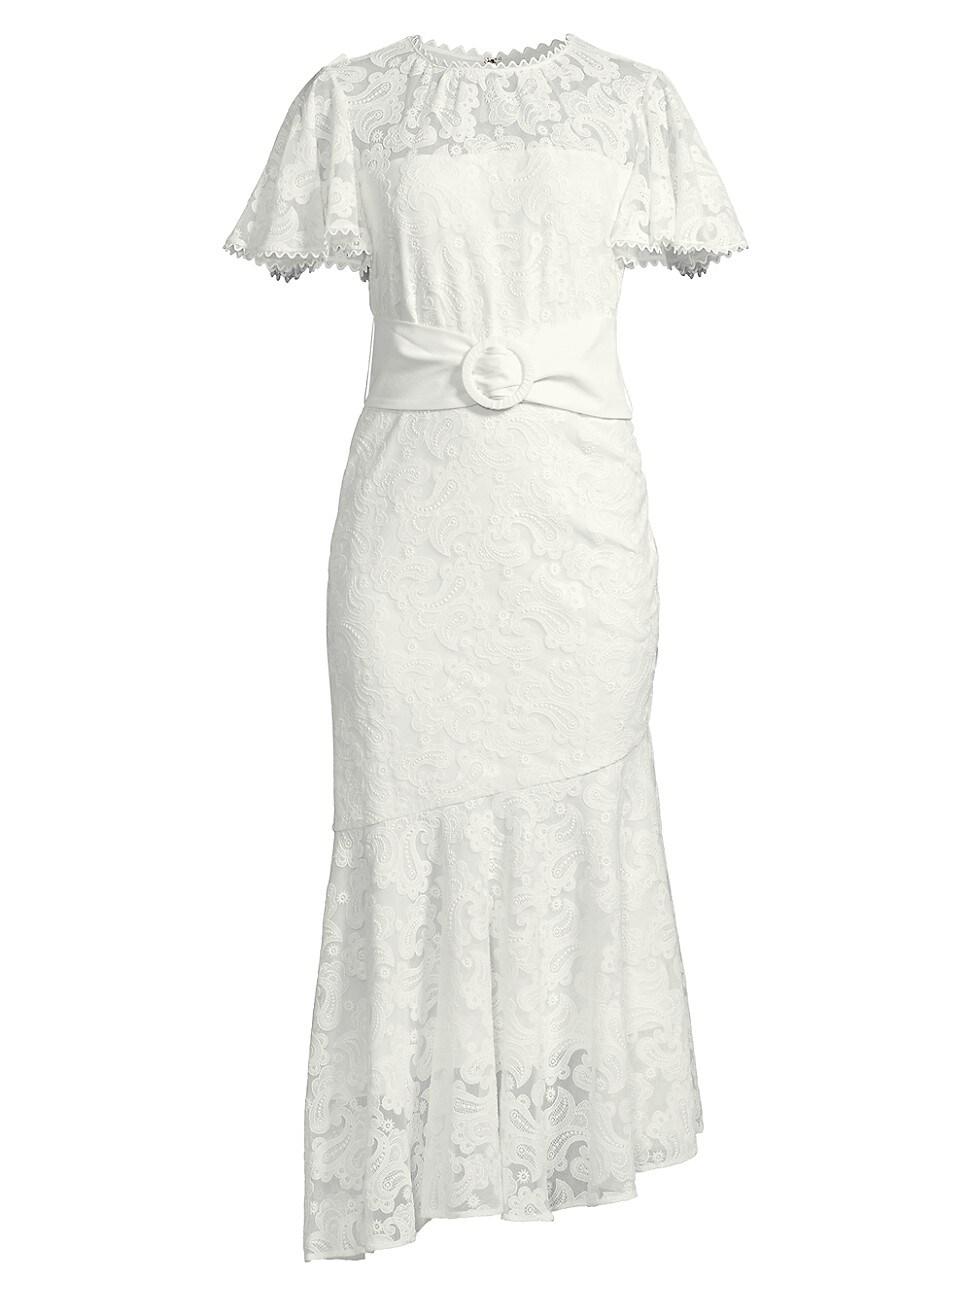 Sachin & Babi Women's Deena Belted Lace Dress In White